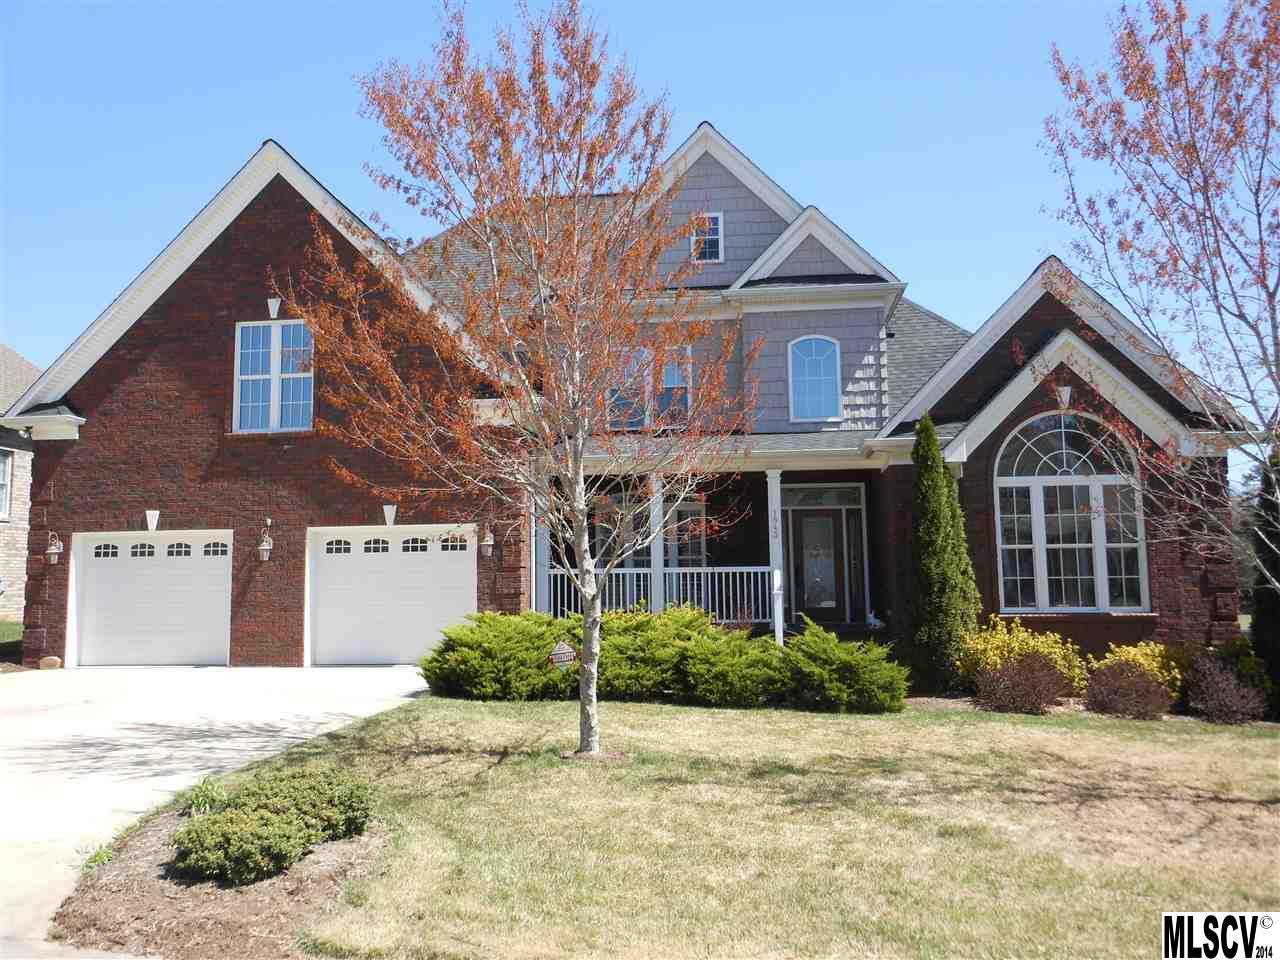 Real Estate for Sale, ListingId:32597524, location: 1843 31ST AVE LN NE Hickory 28601